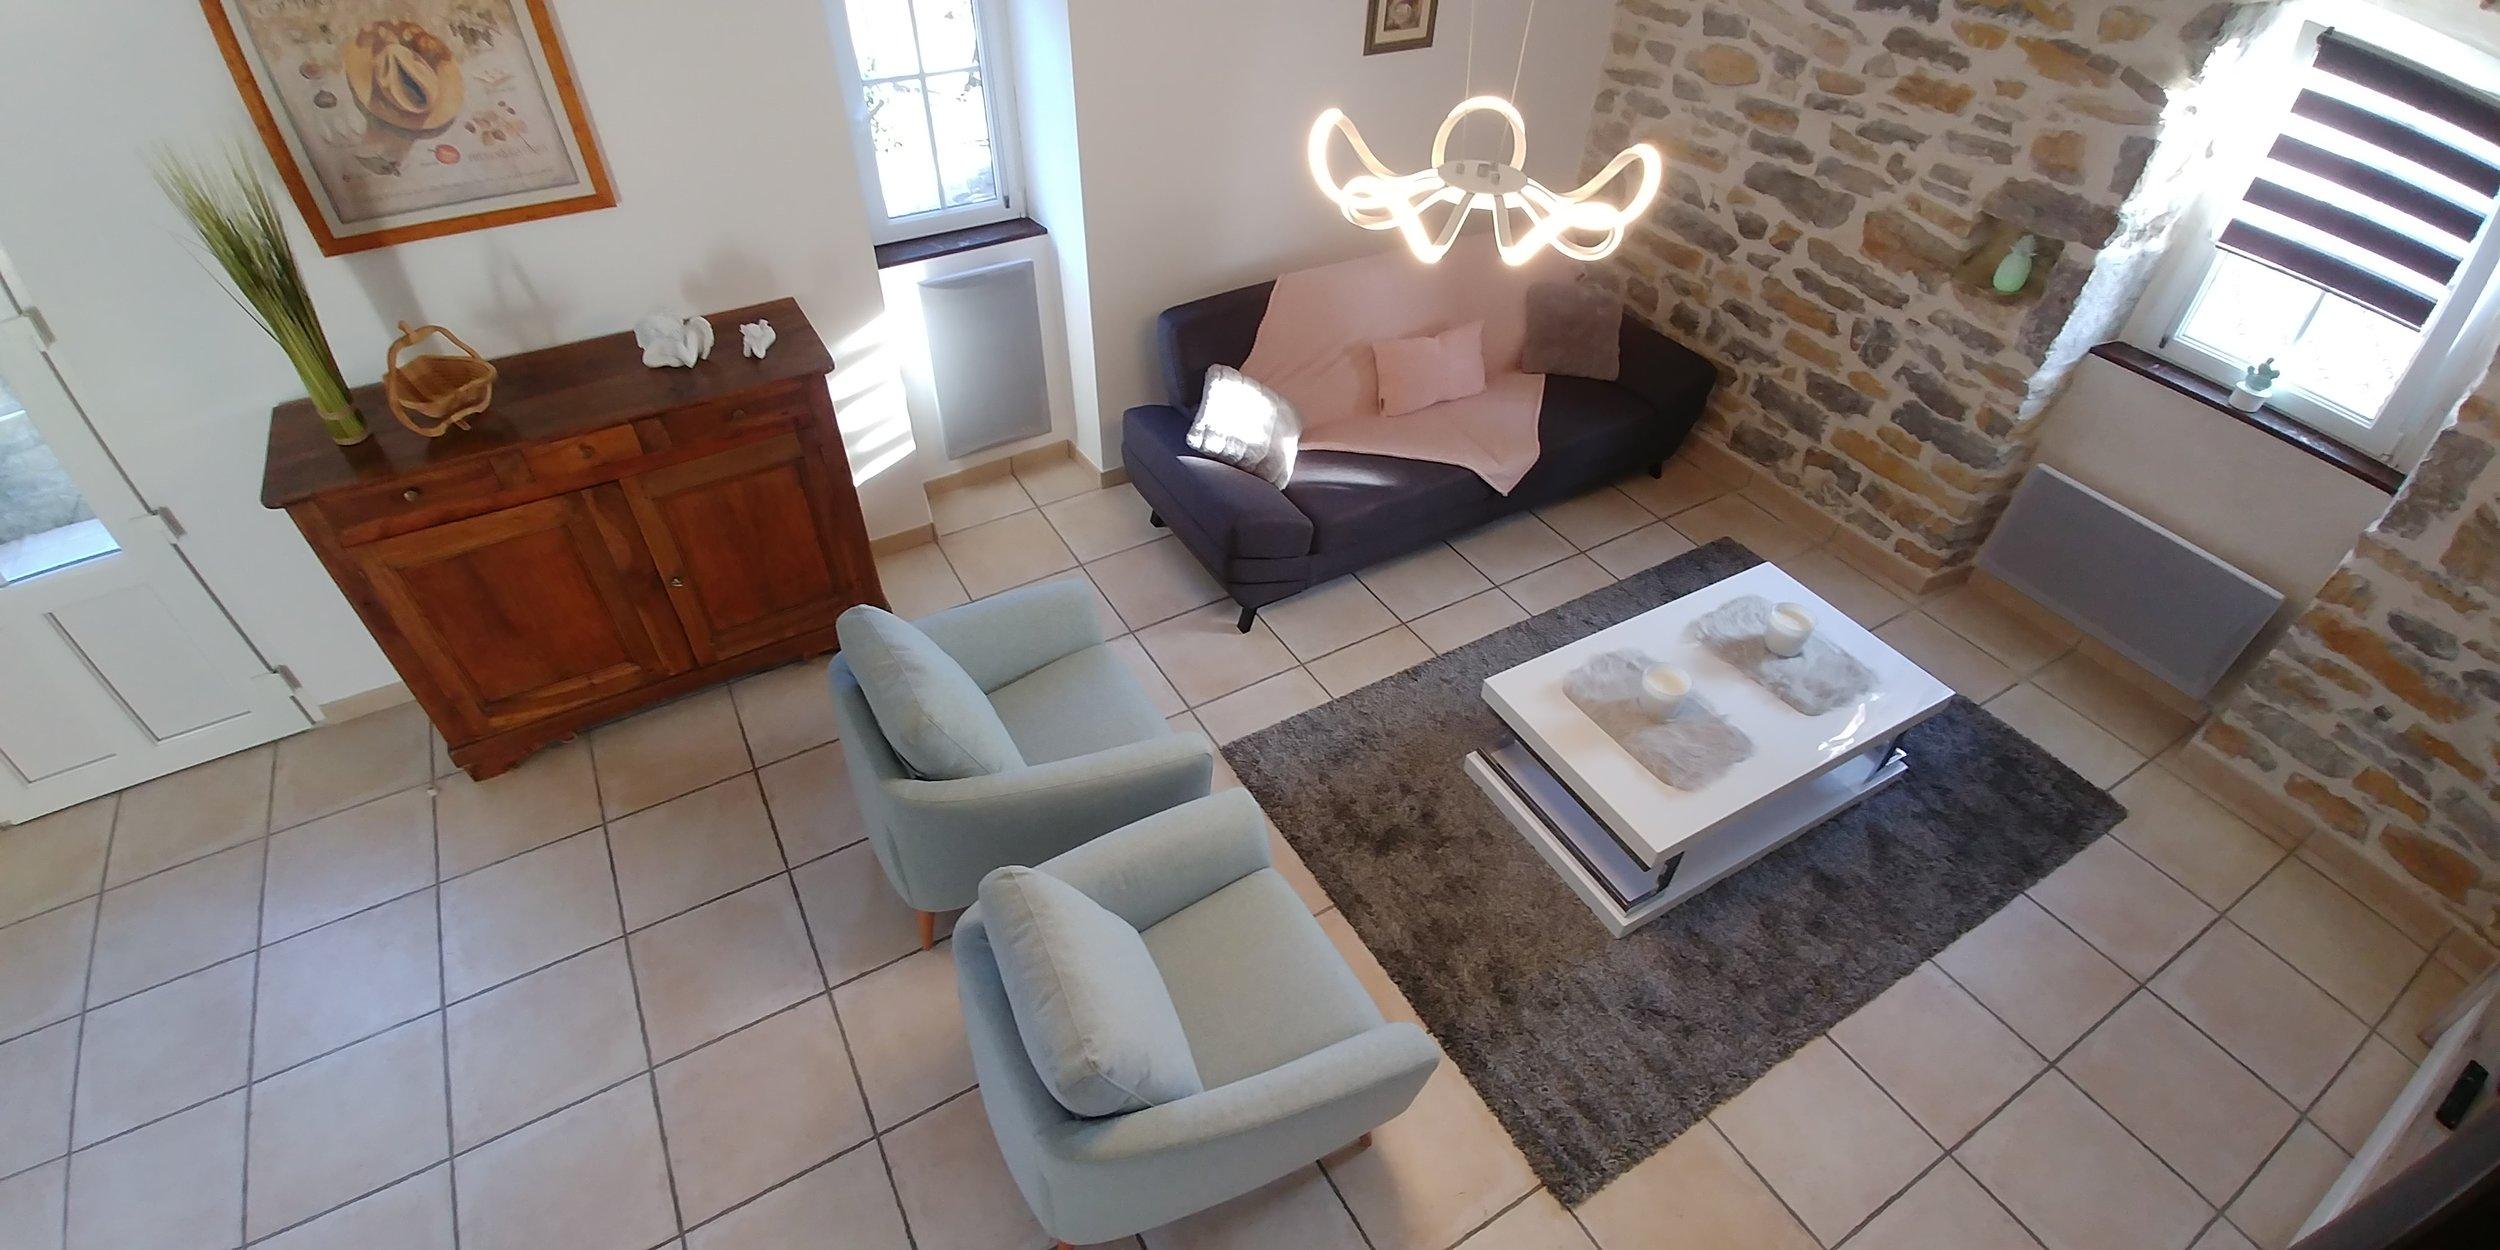 CampingLeChamadou-sudardeche-4etoiles-location-gites-lasoleiade1.jpg